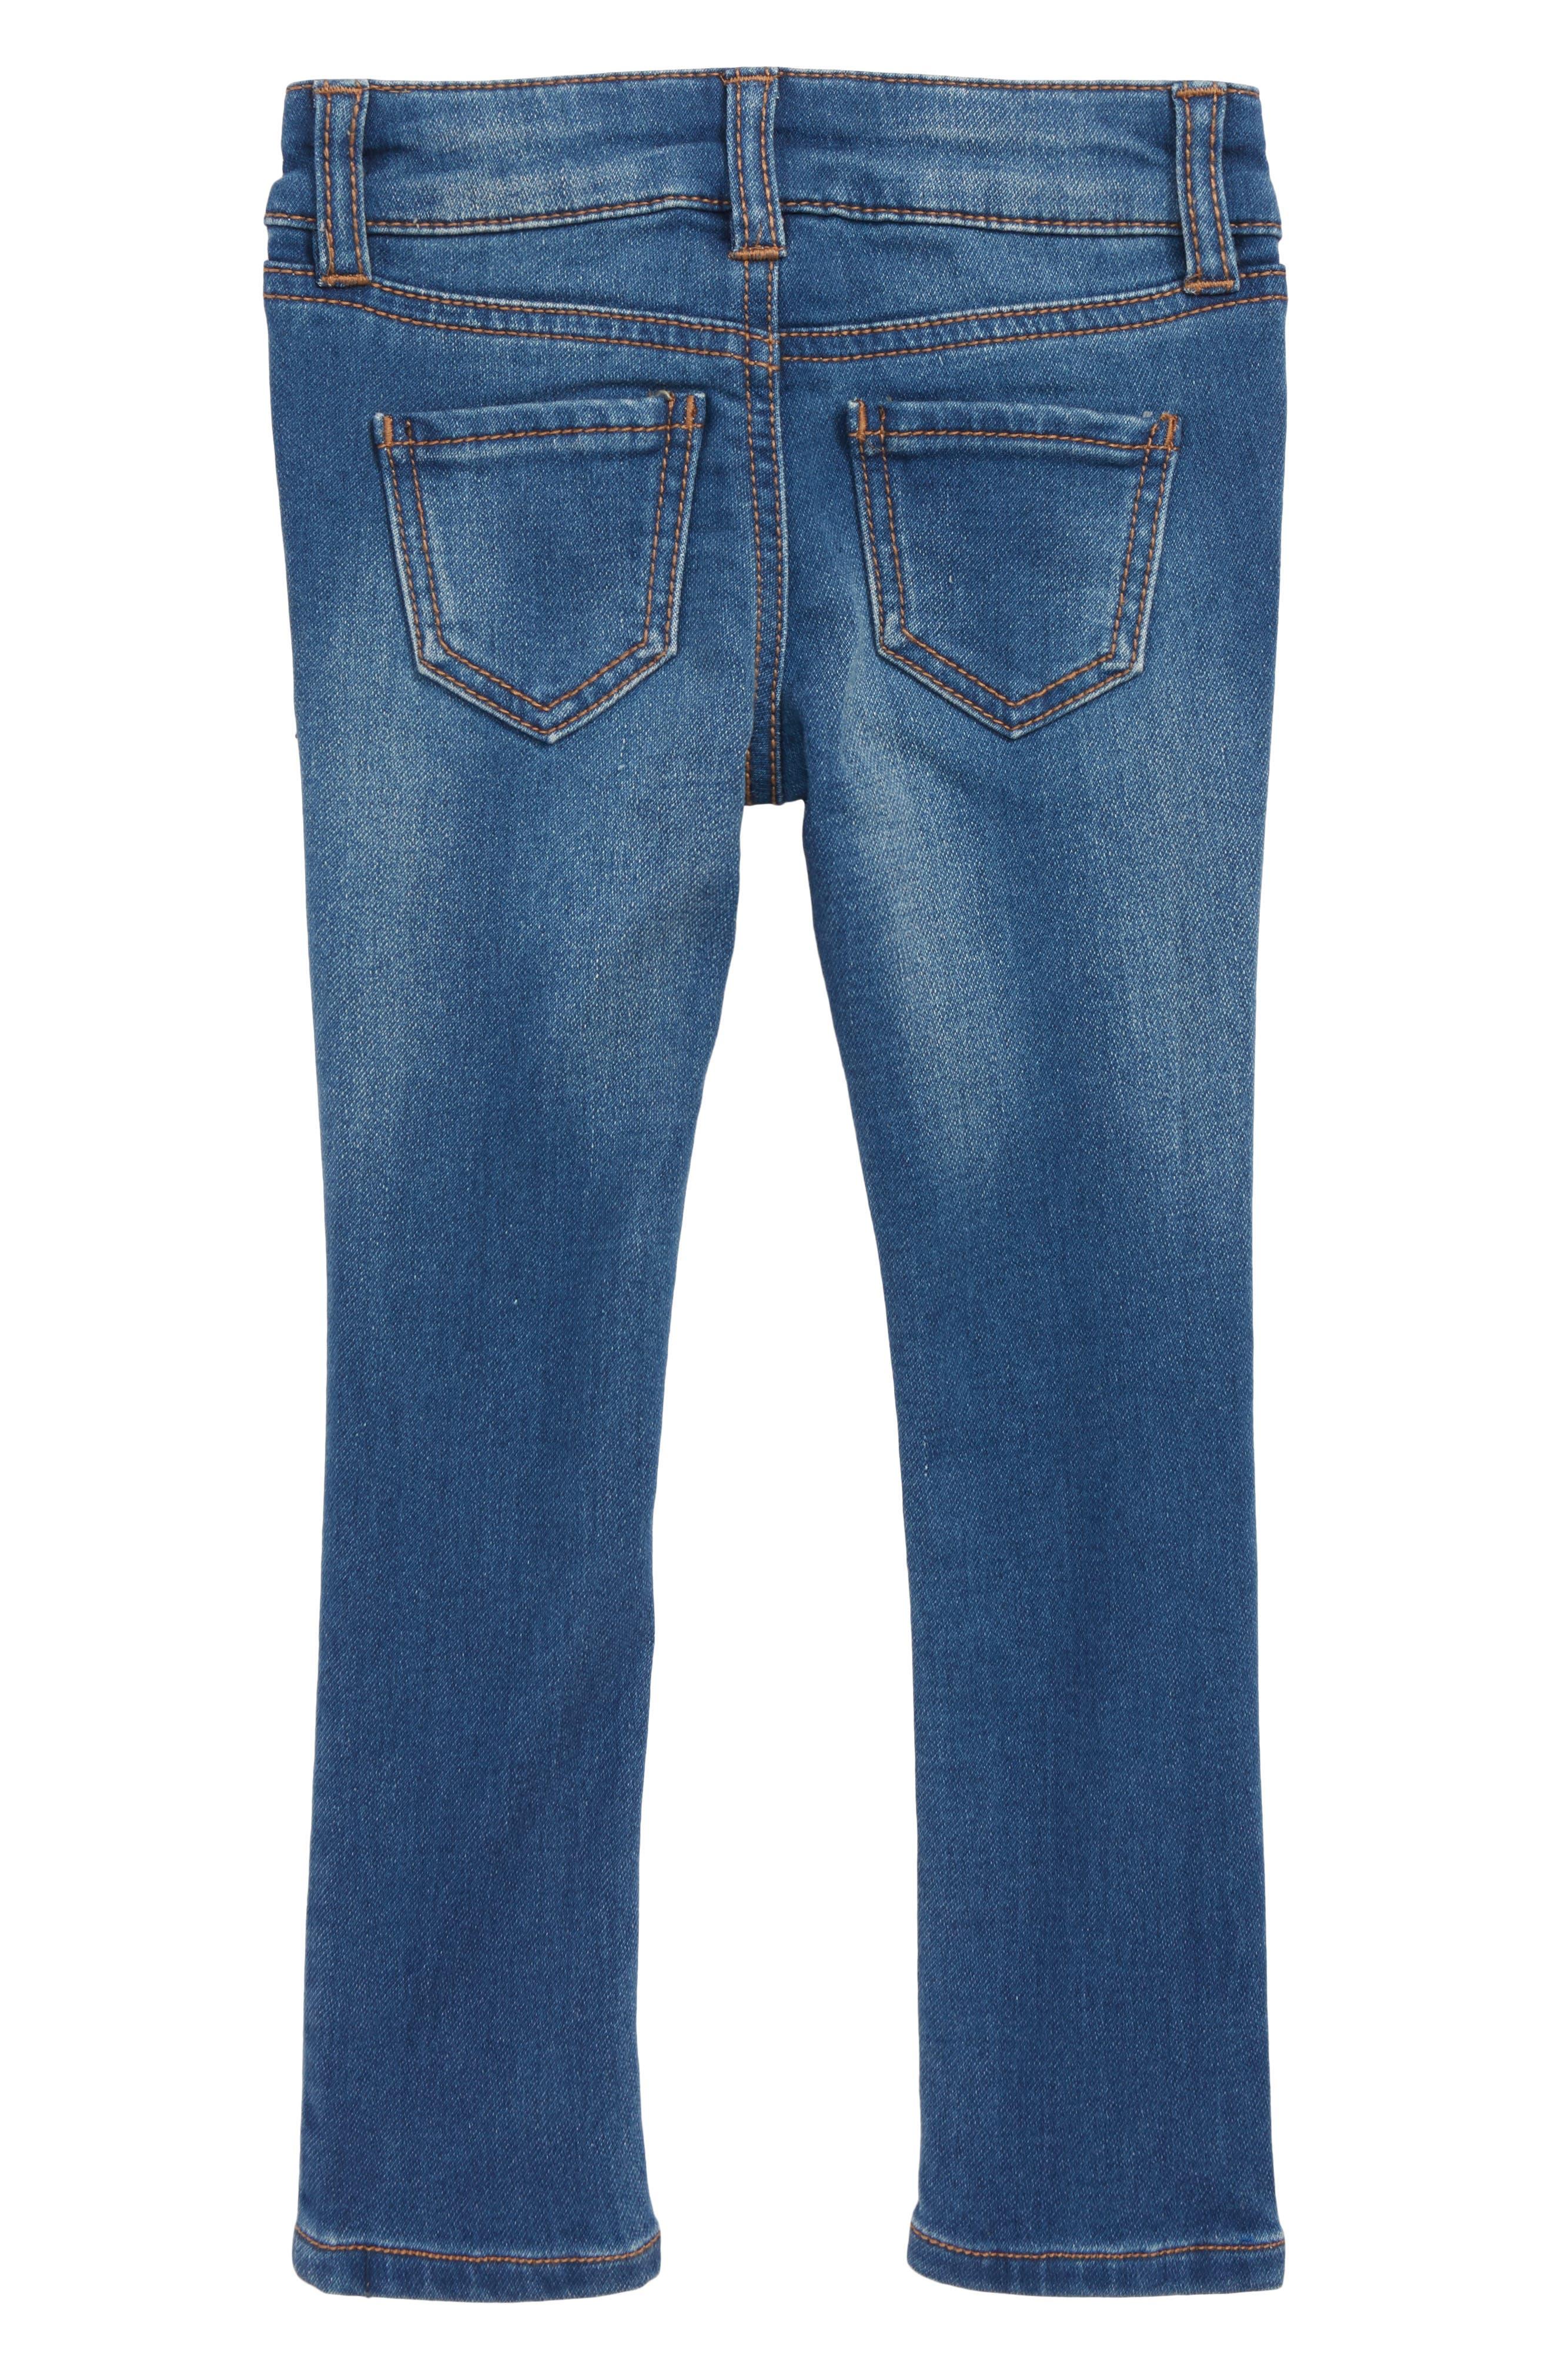 Peek Taylor Jeans,                             Alternate thumbnail 2, color,                             464